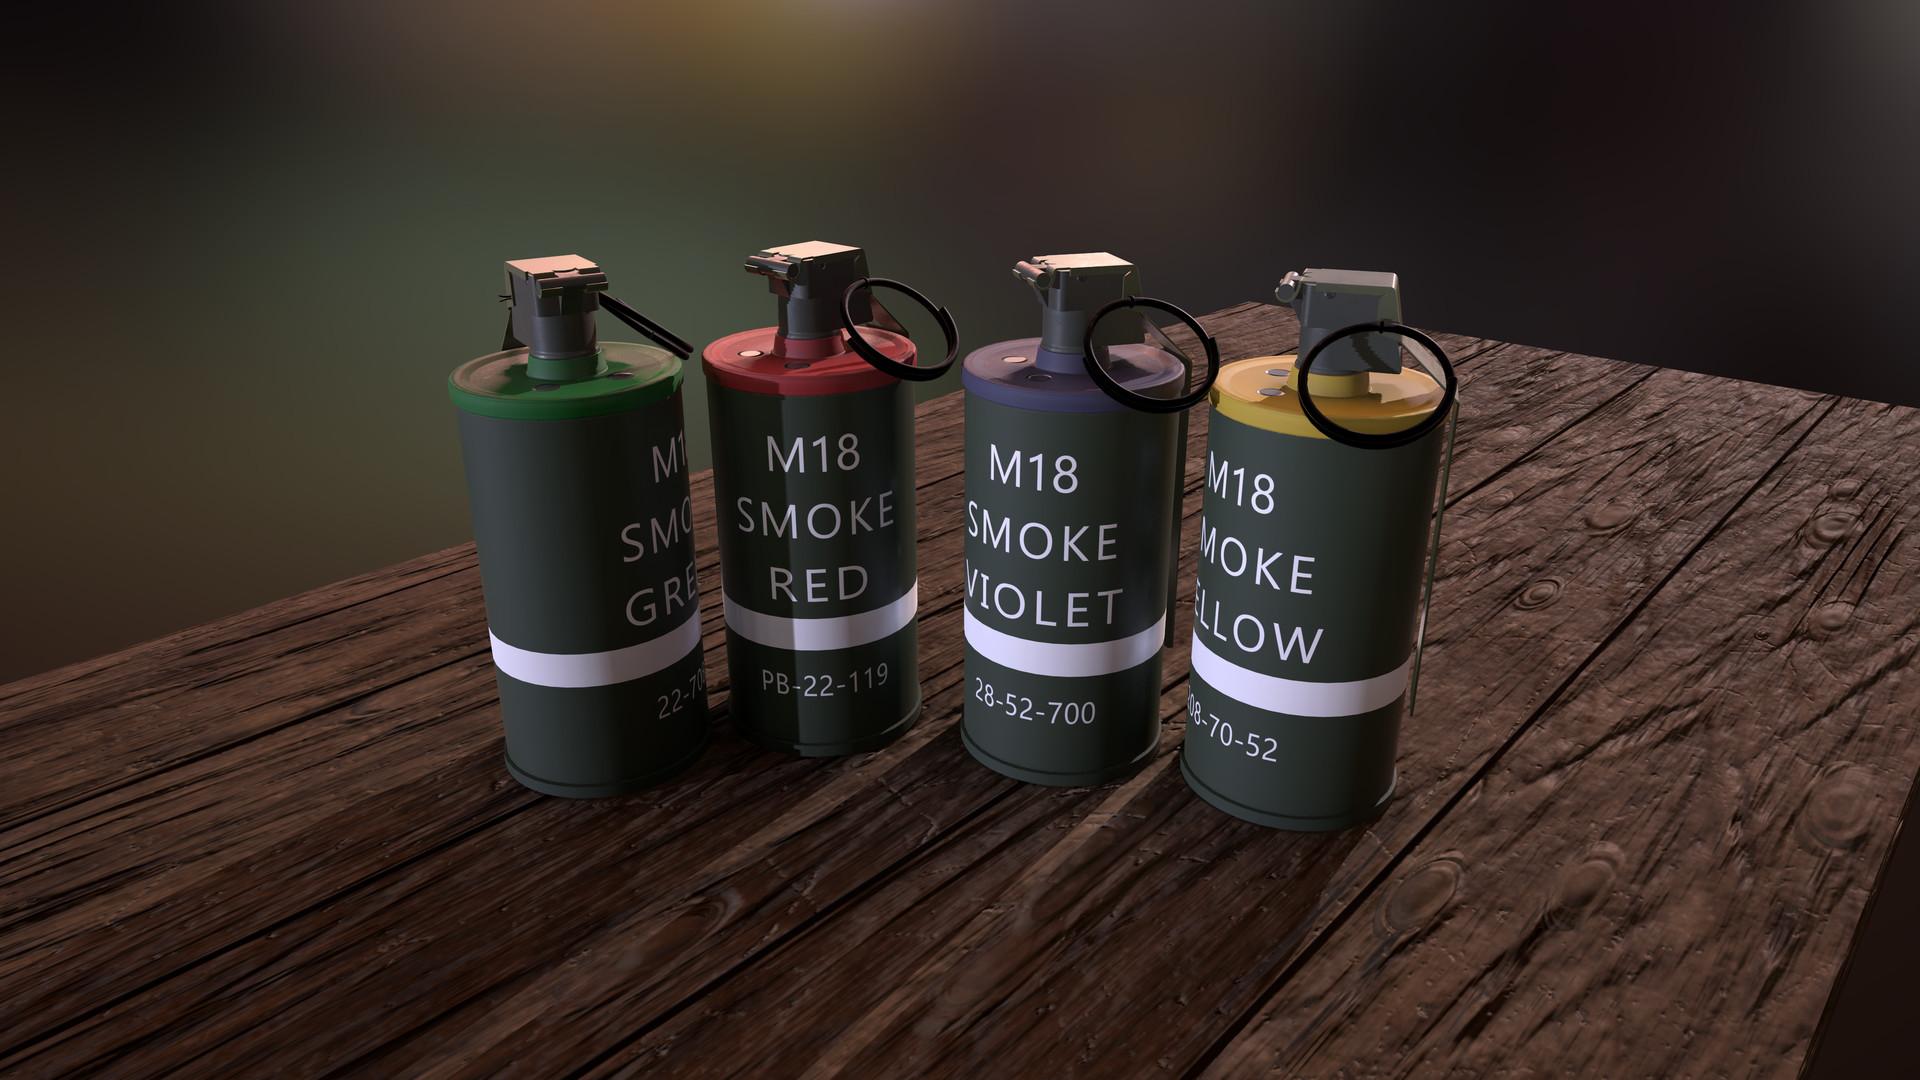 ArtStation - M18 Smoke Grenades, Nick Moore